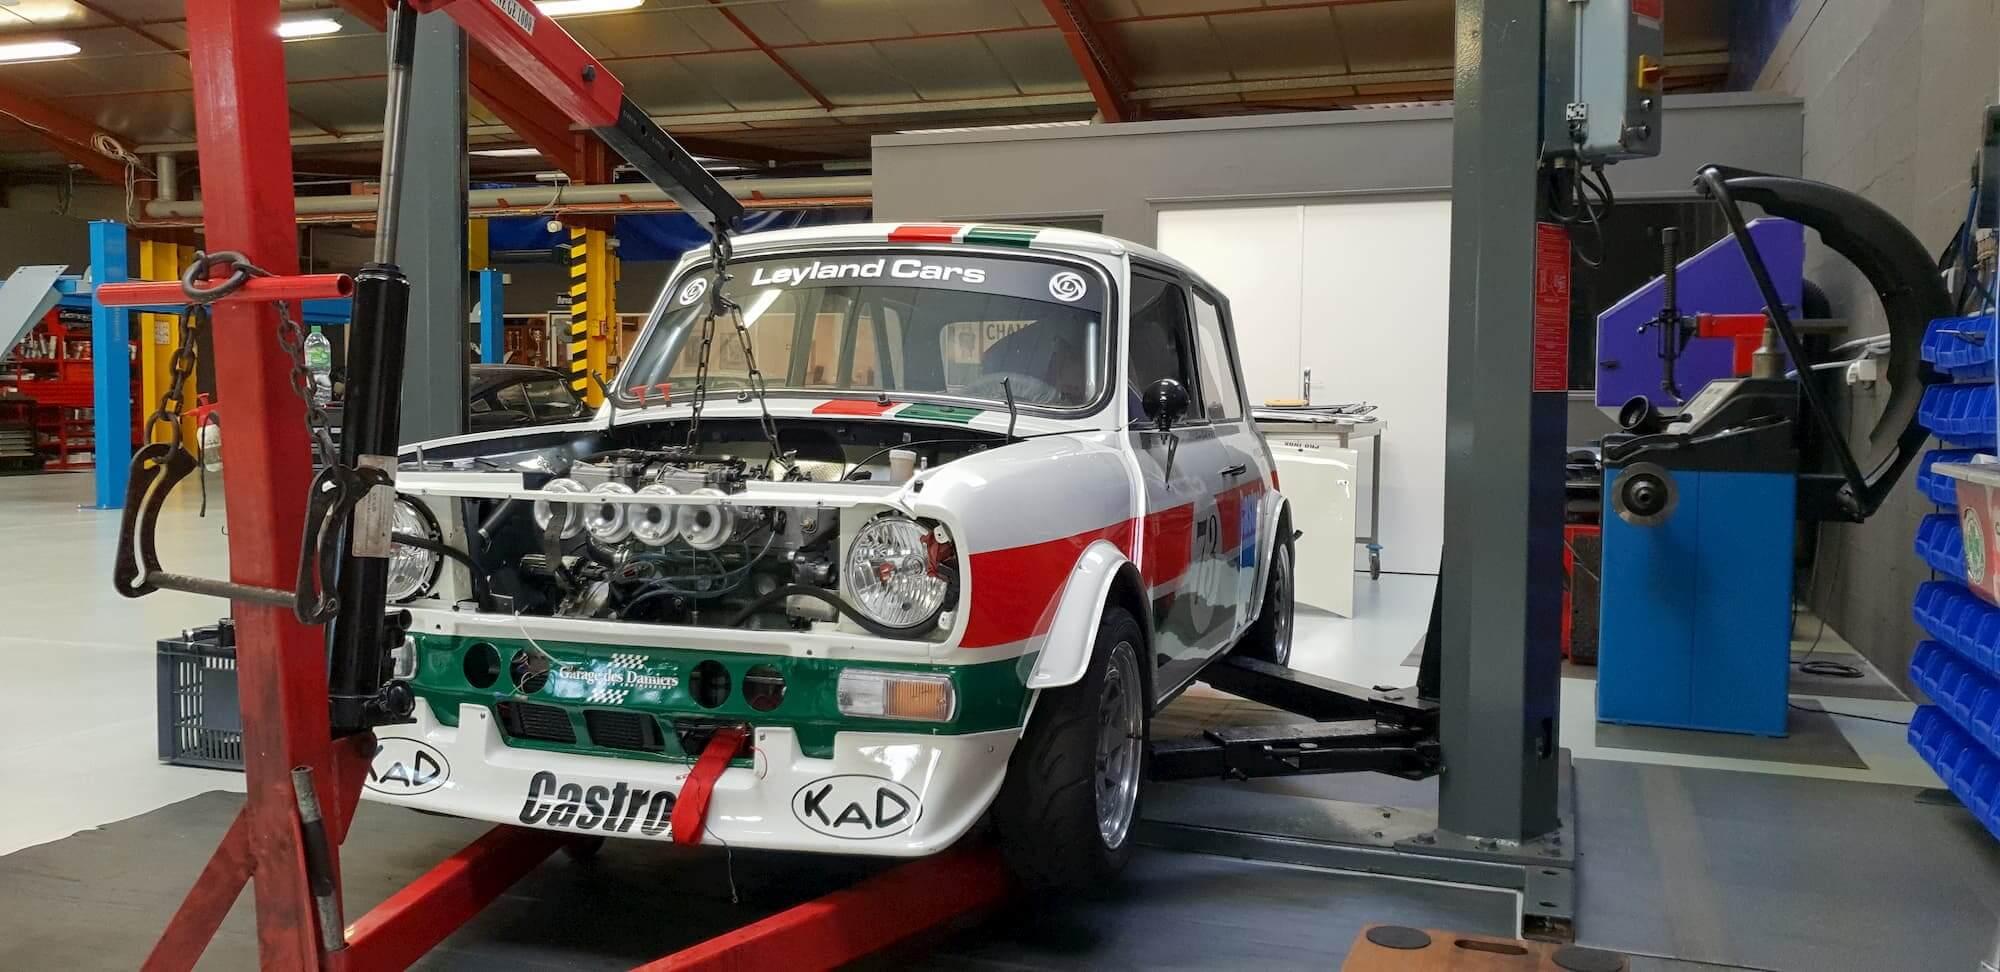 Mini 1275GT Race Engineering - vintage racing car - Castrol